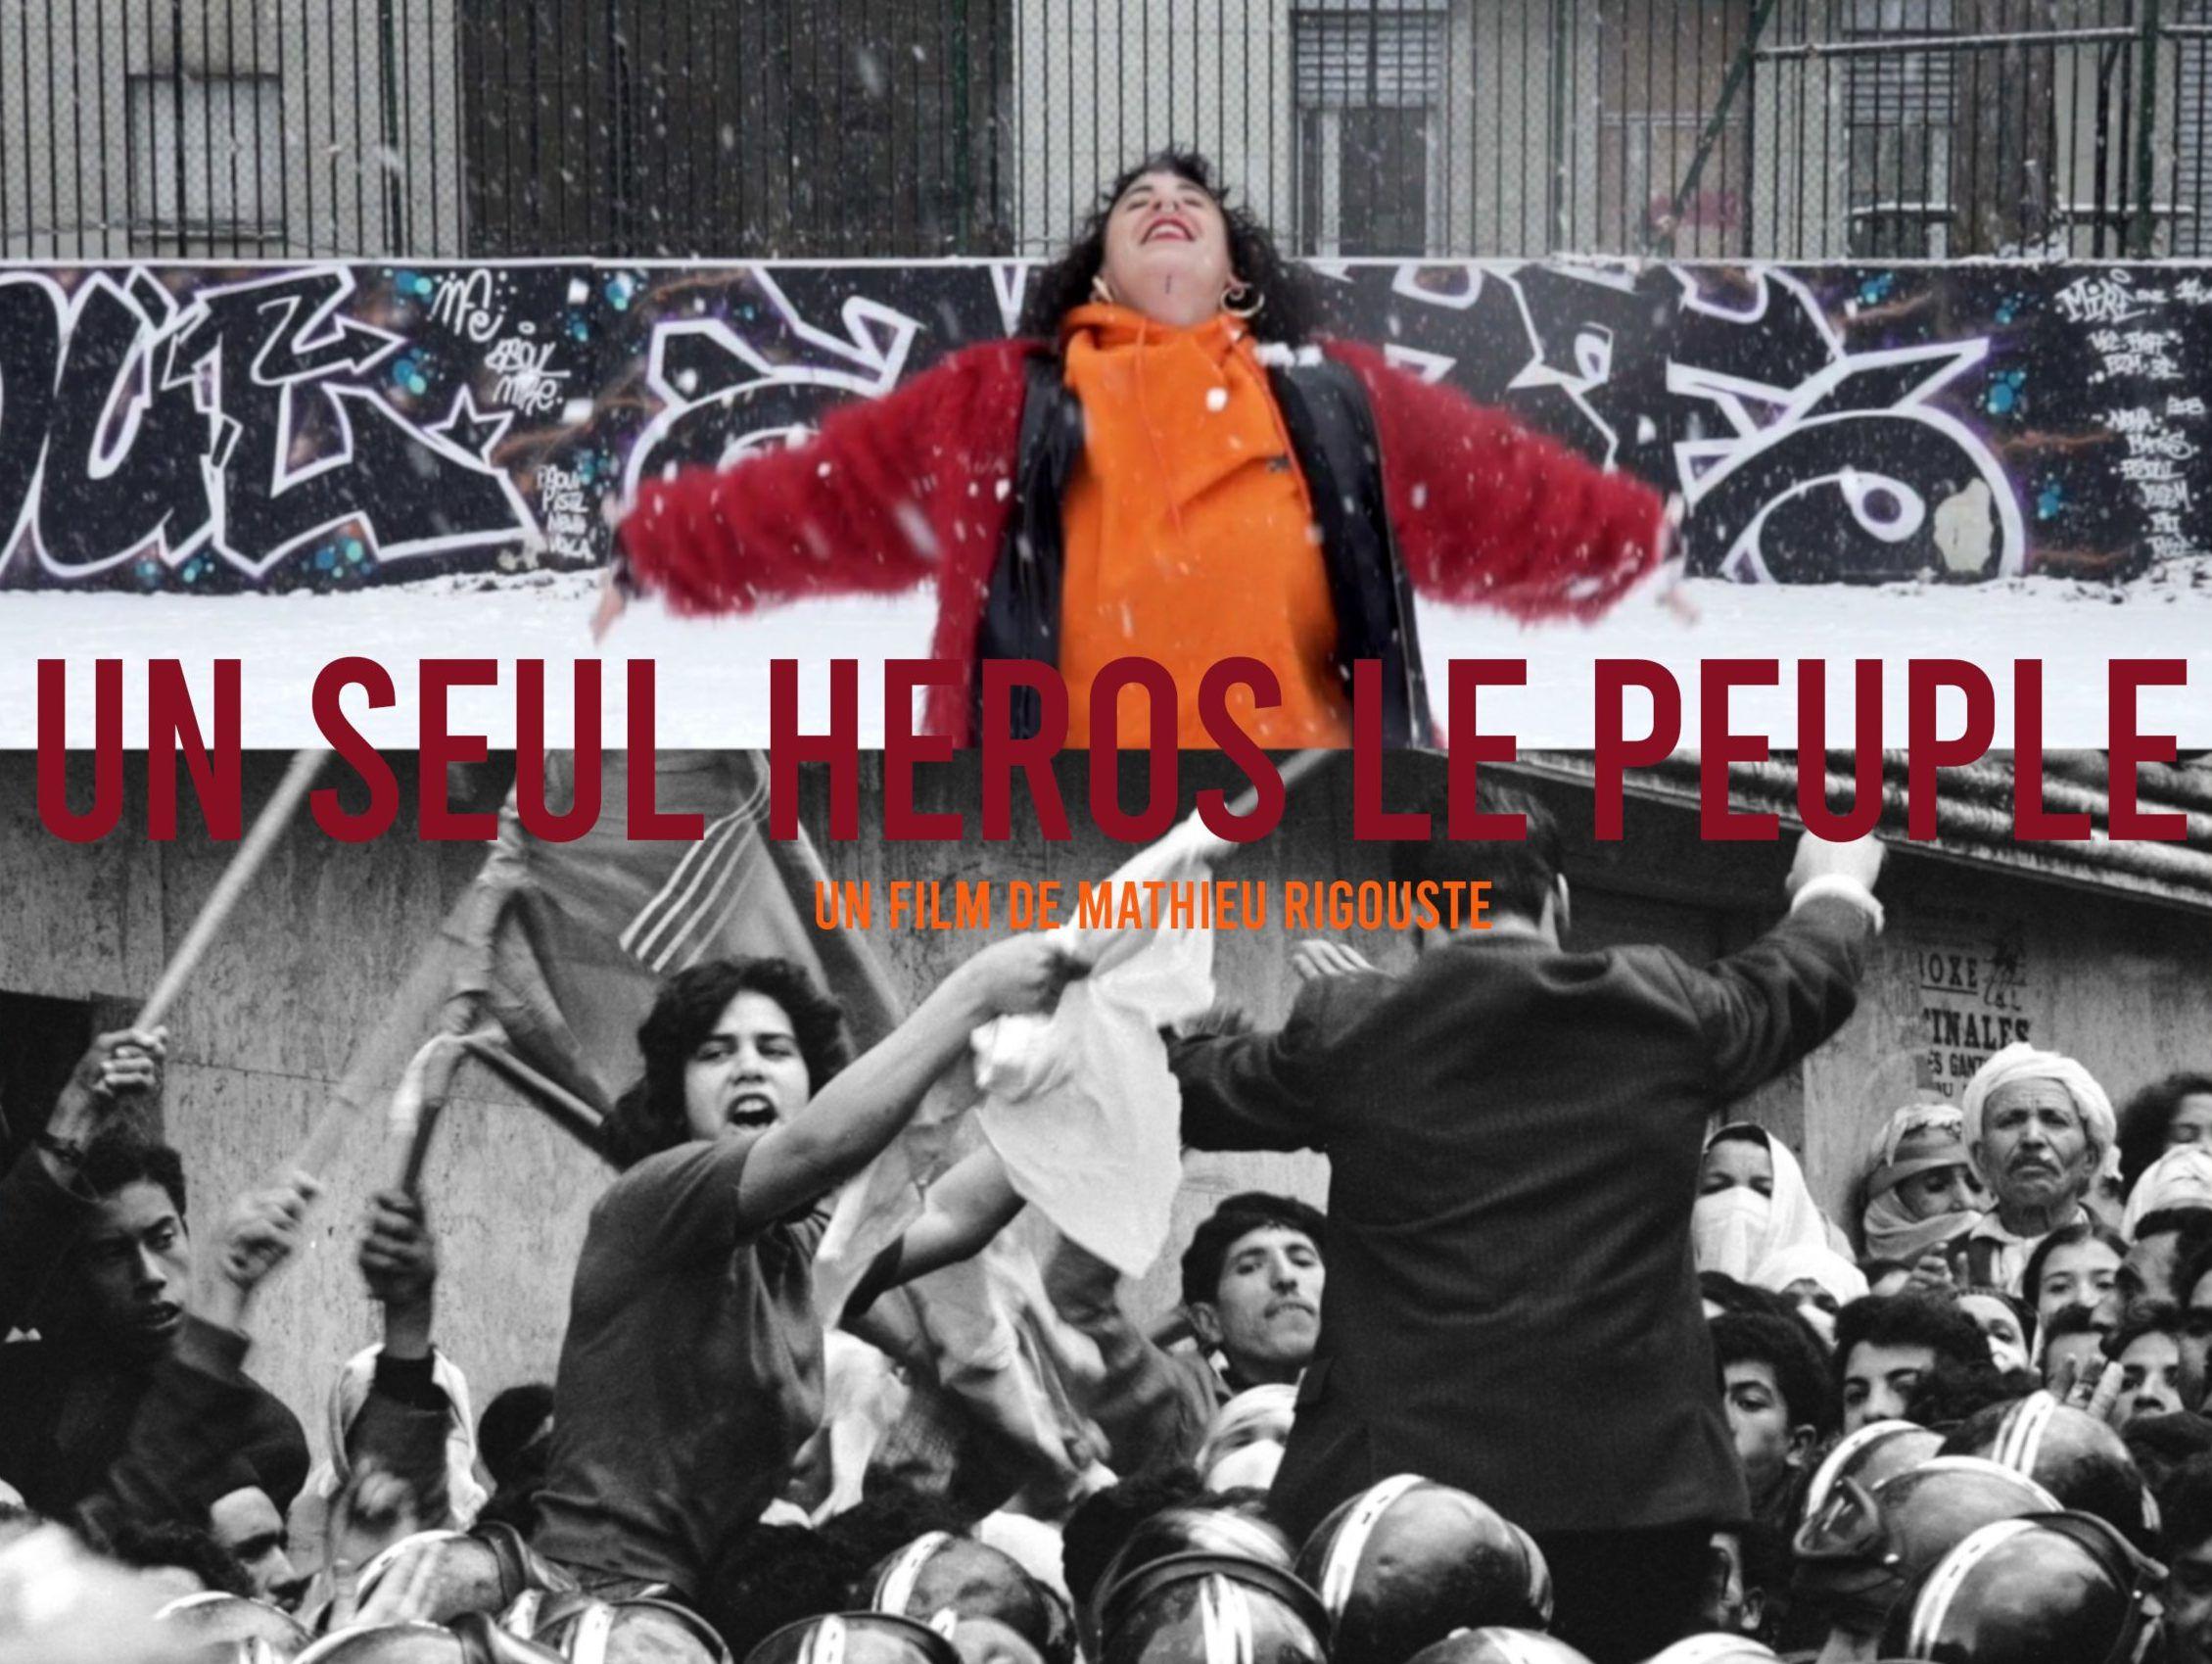 Un seul héros, le peuple - Documentaire (2013)